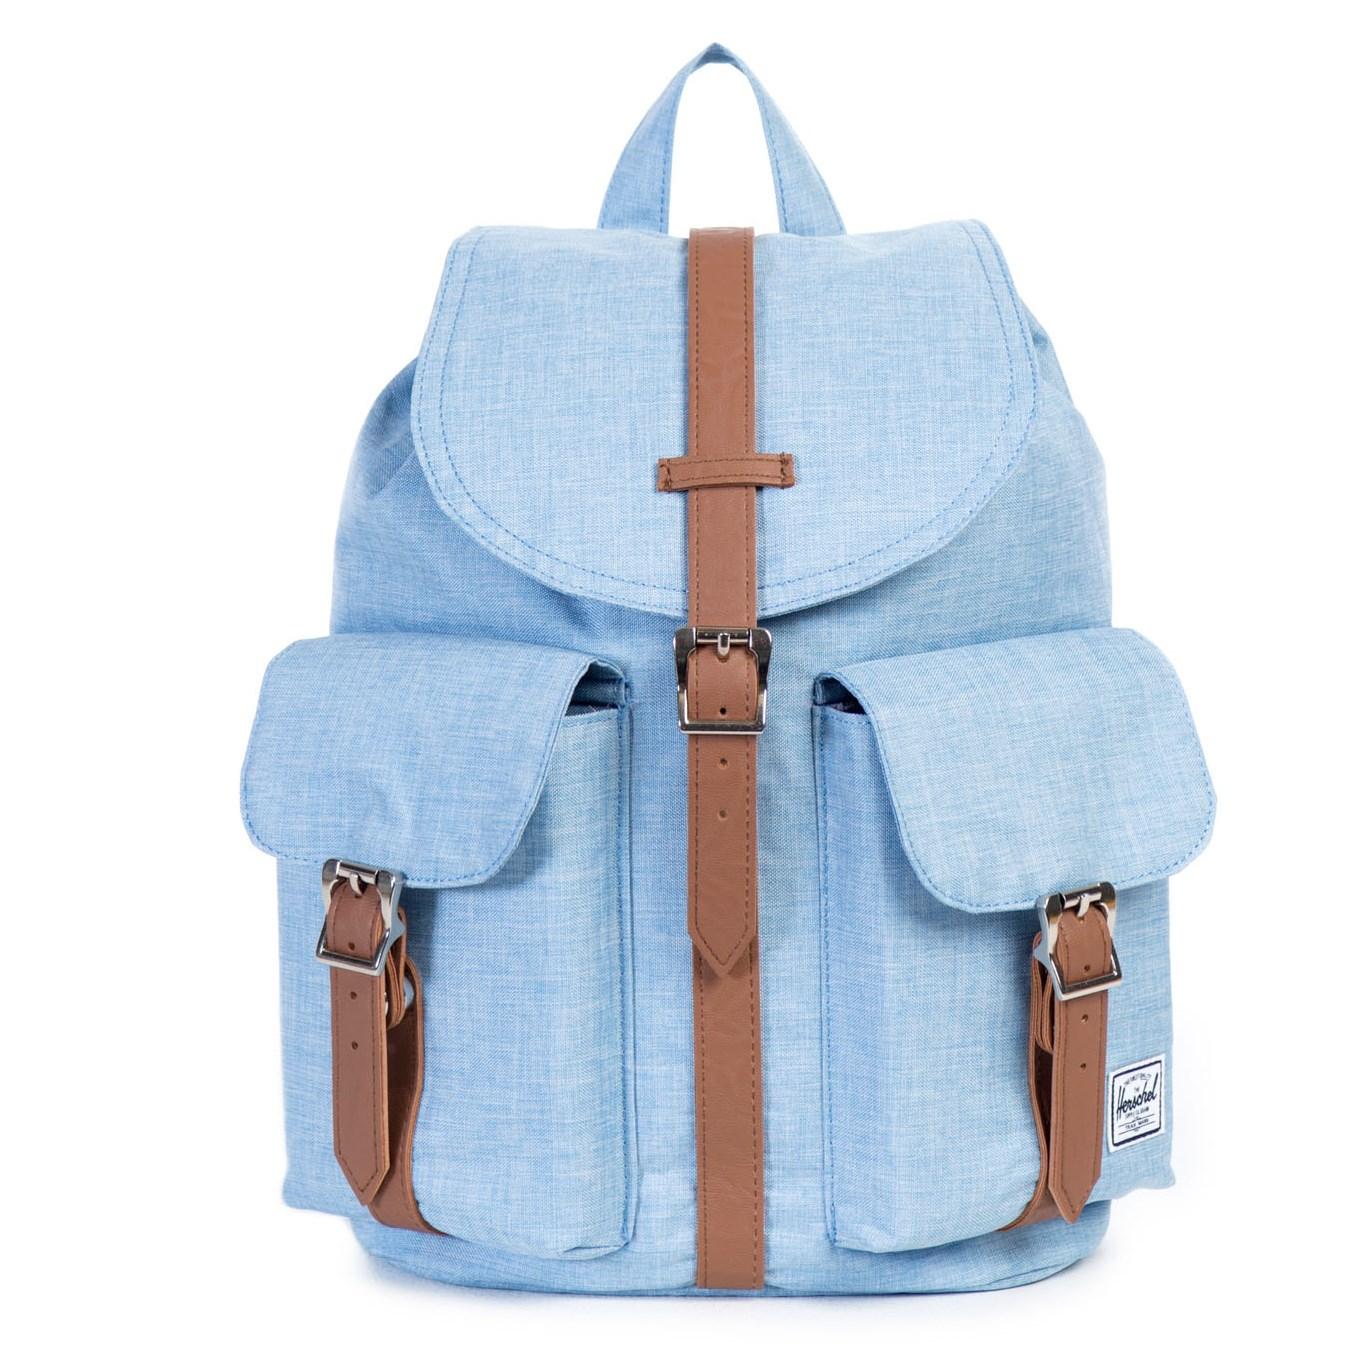 f7380f20831 Herschel Mini Size Dawson Backpack- Fenix Toulouse Handball